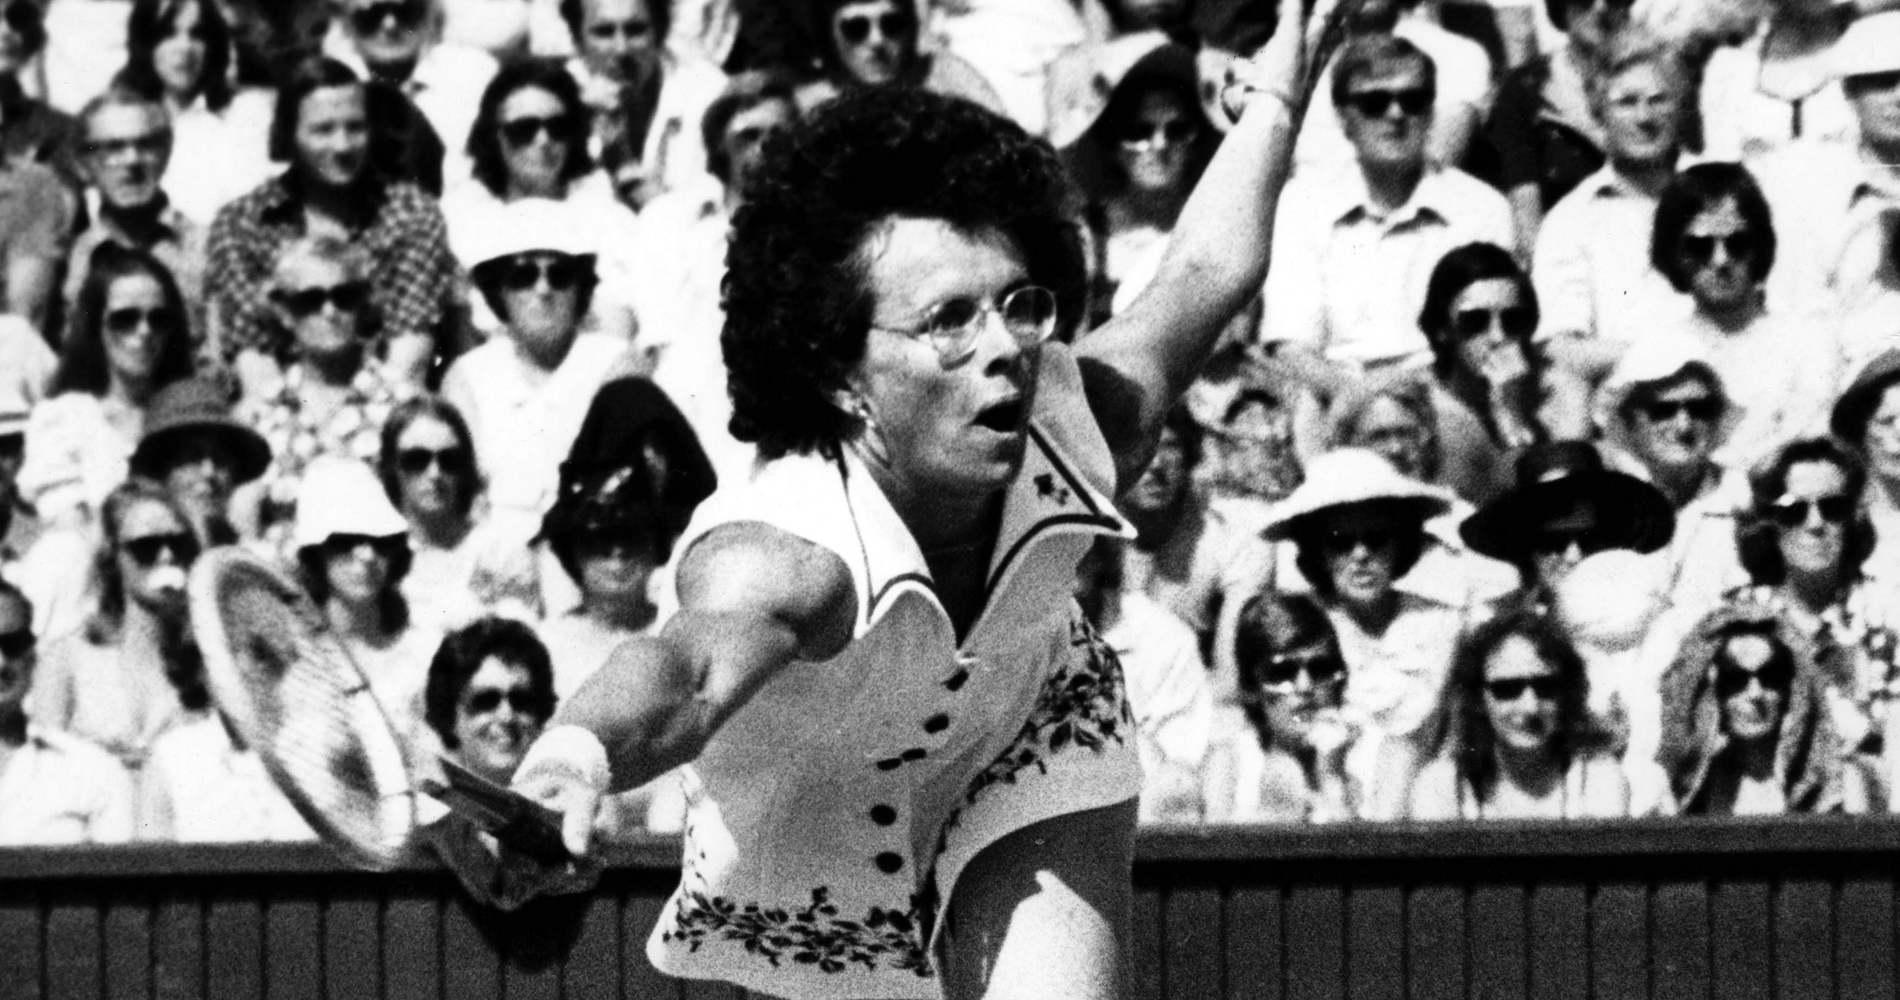 Billie Jean King, 1975 Wimbledon